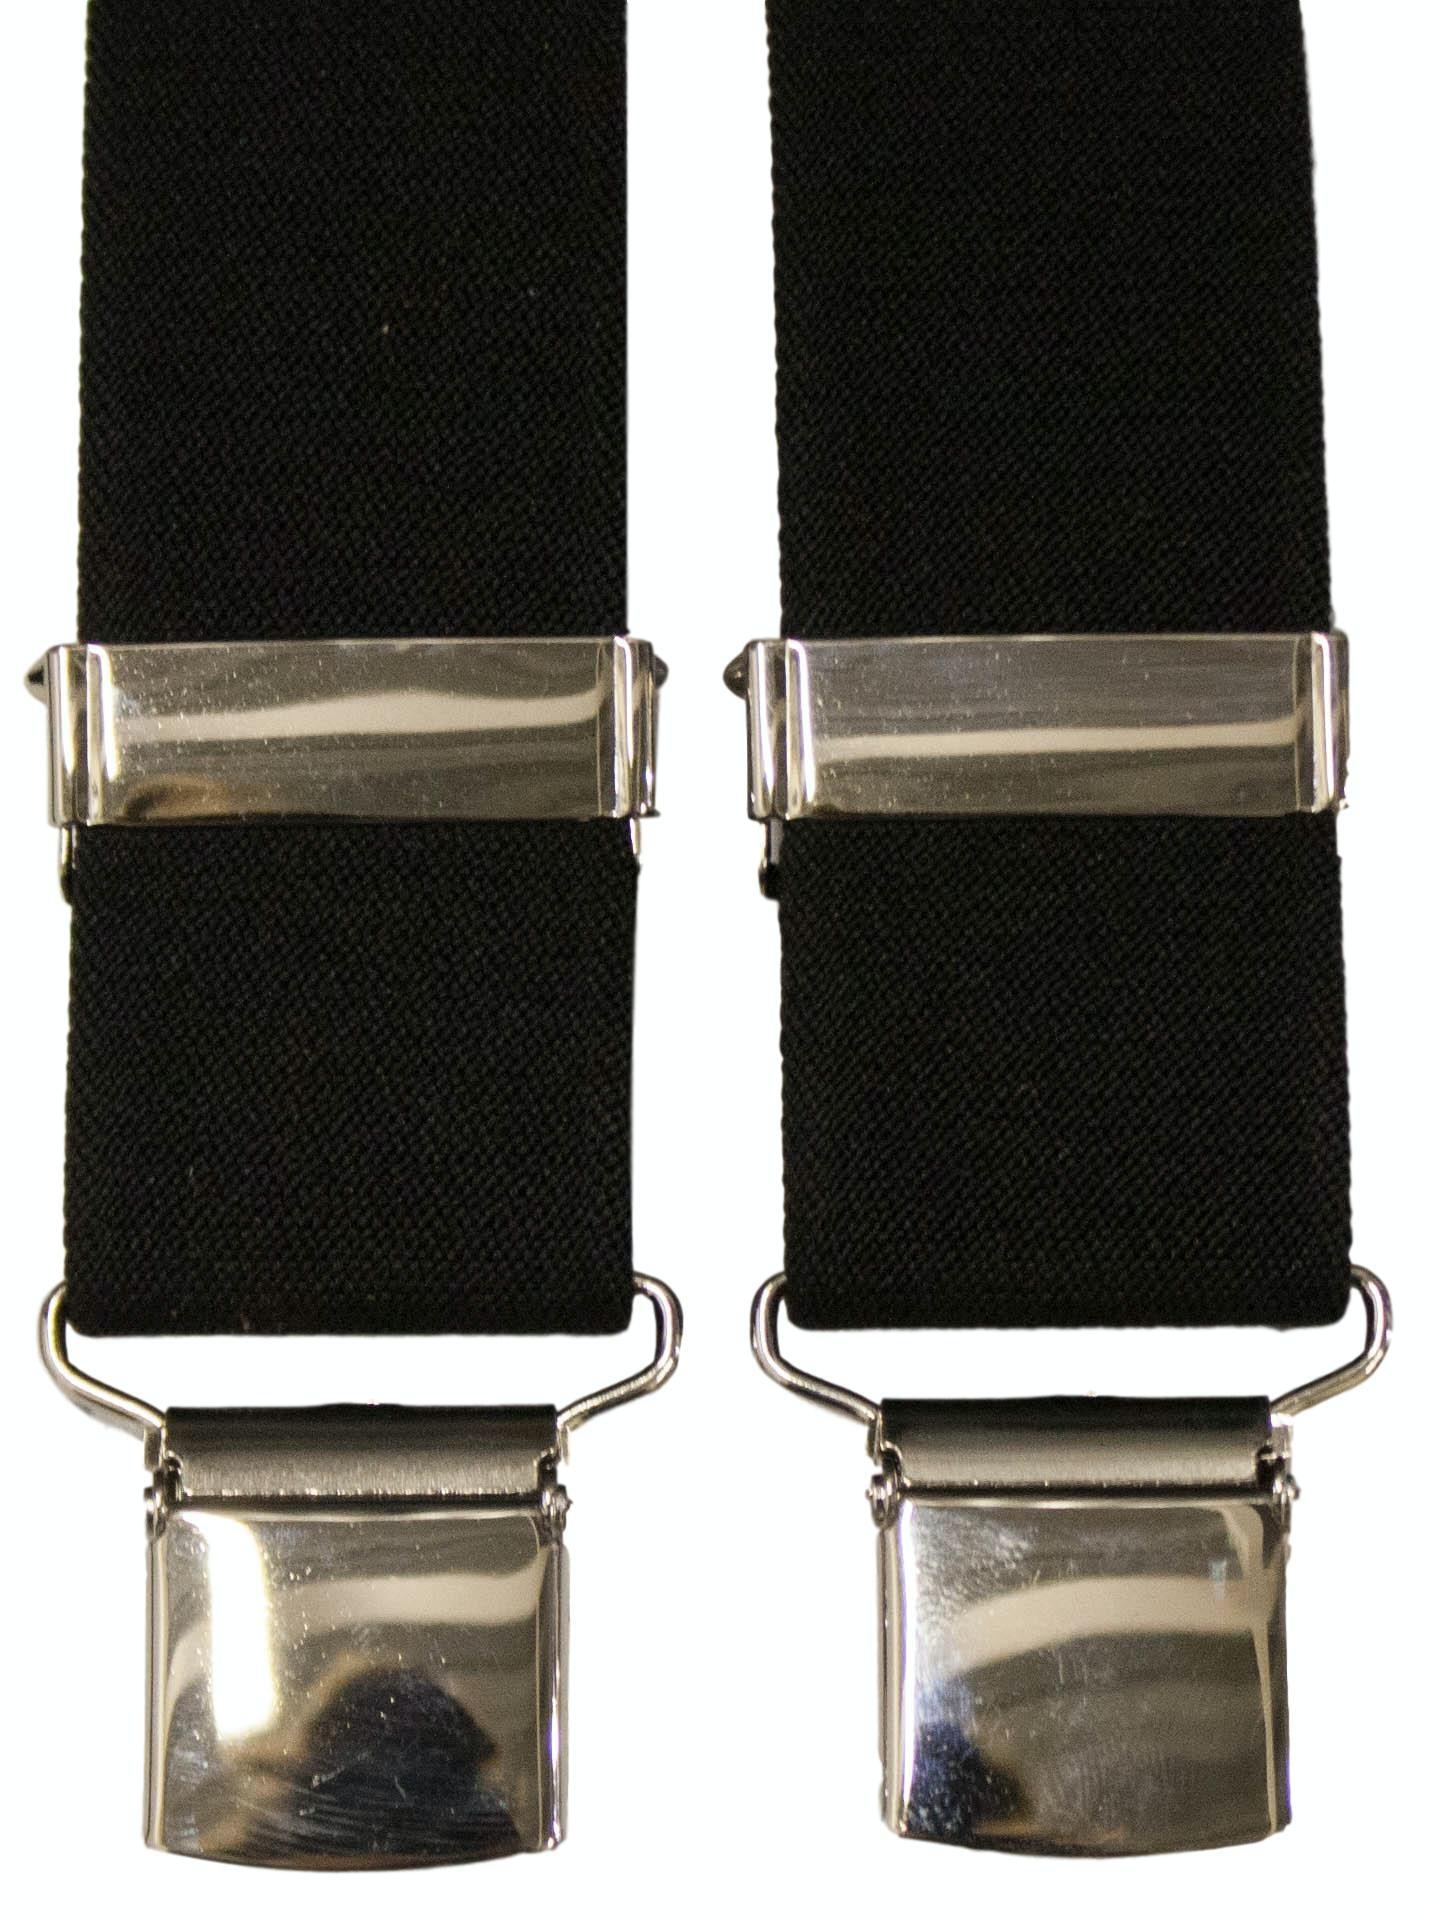 Tex Appeal Extra Long Braces Black